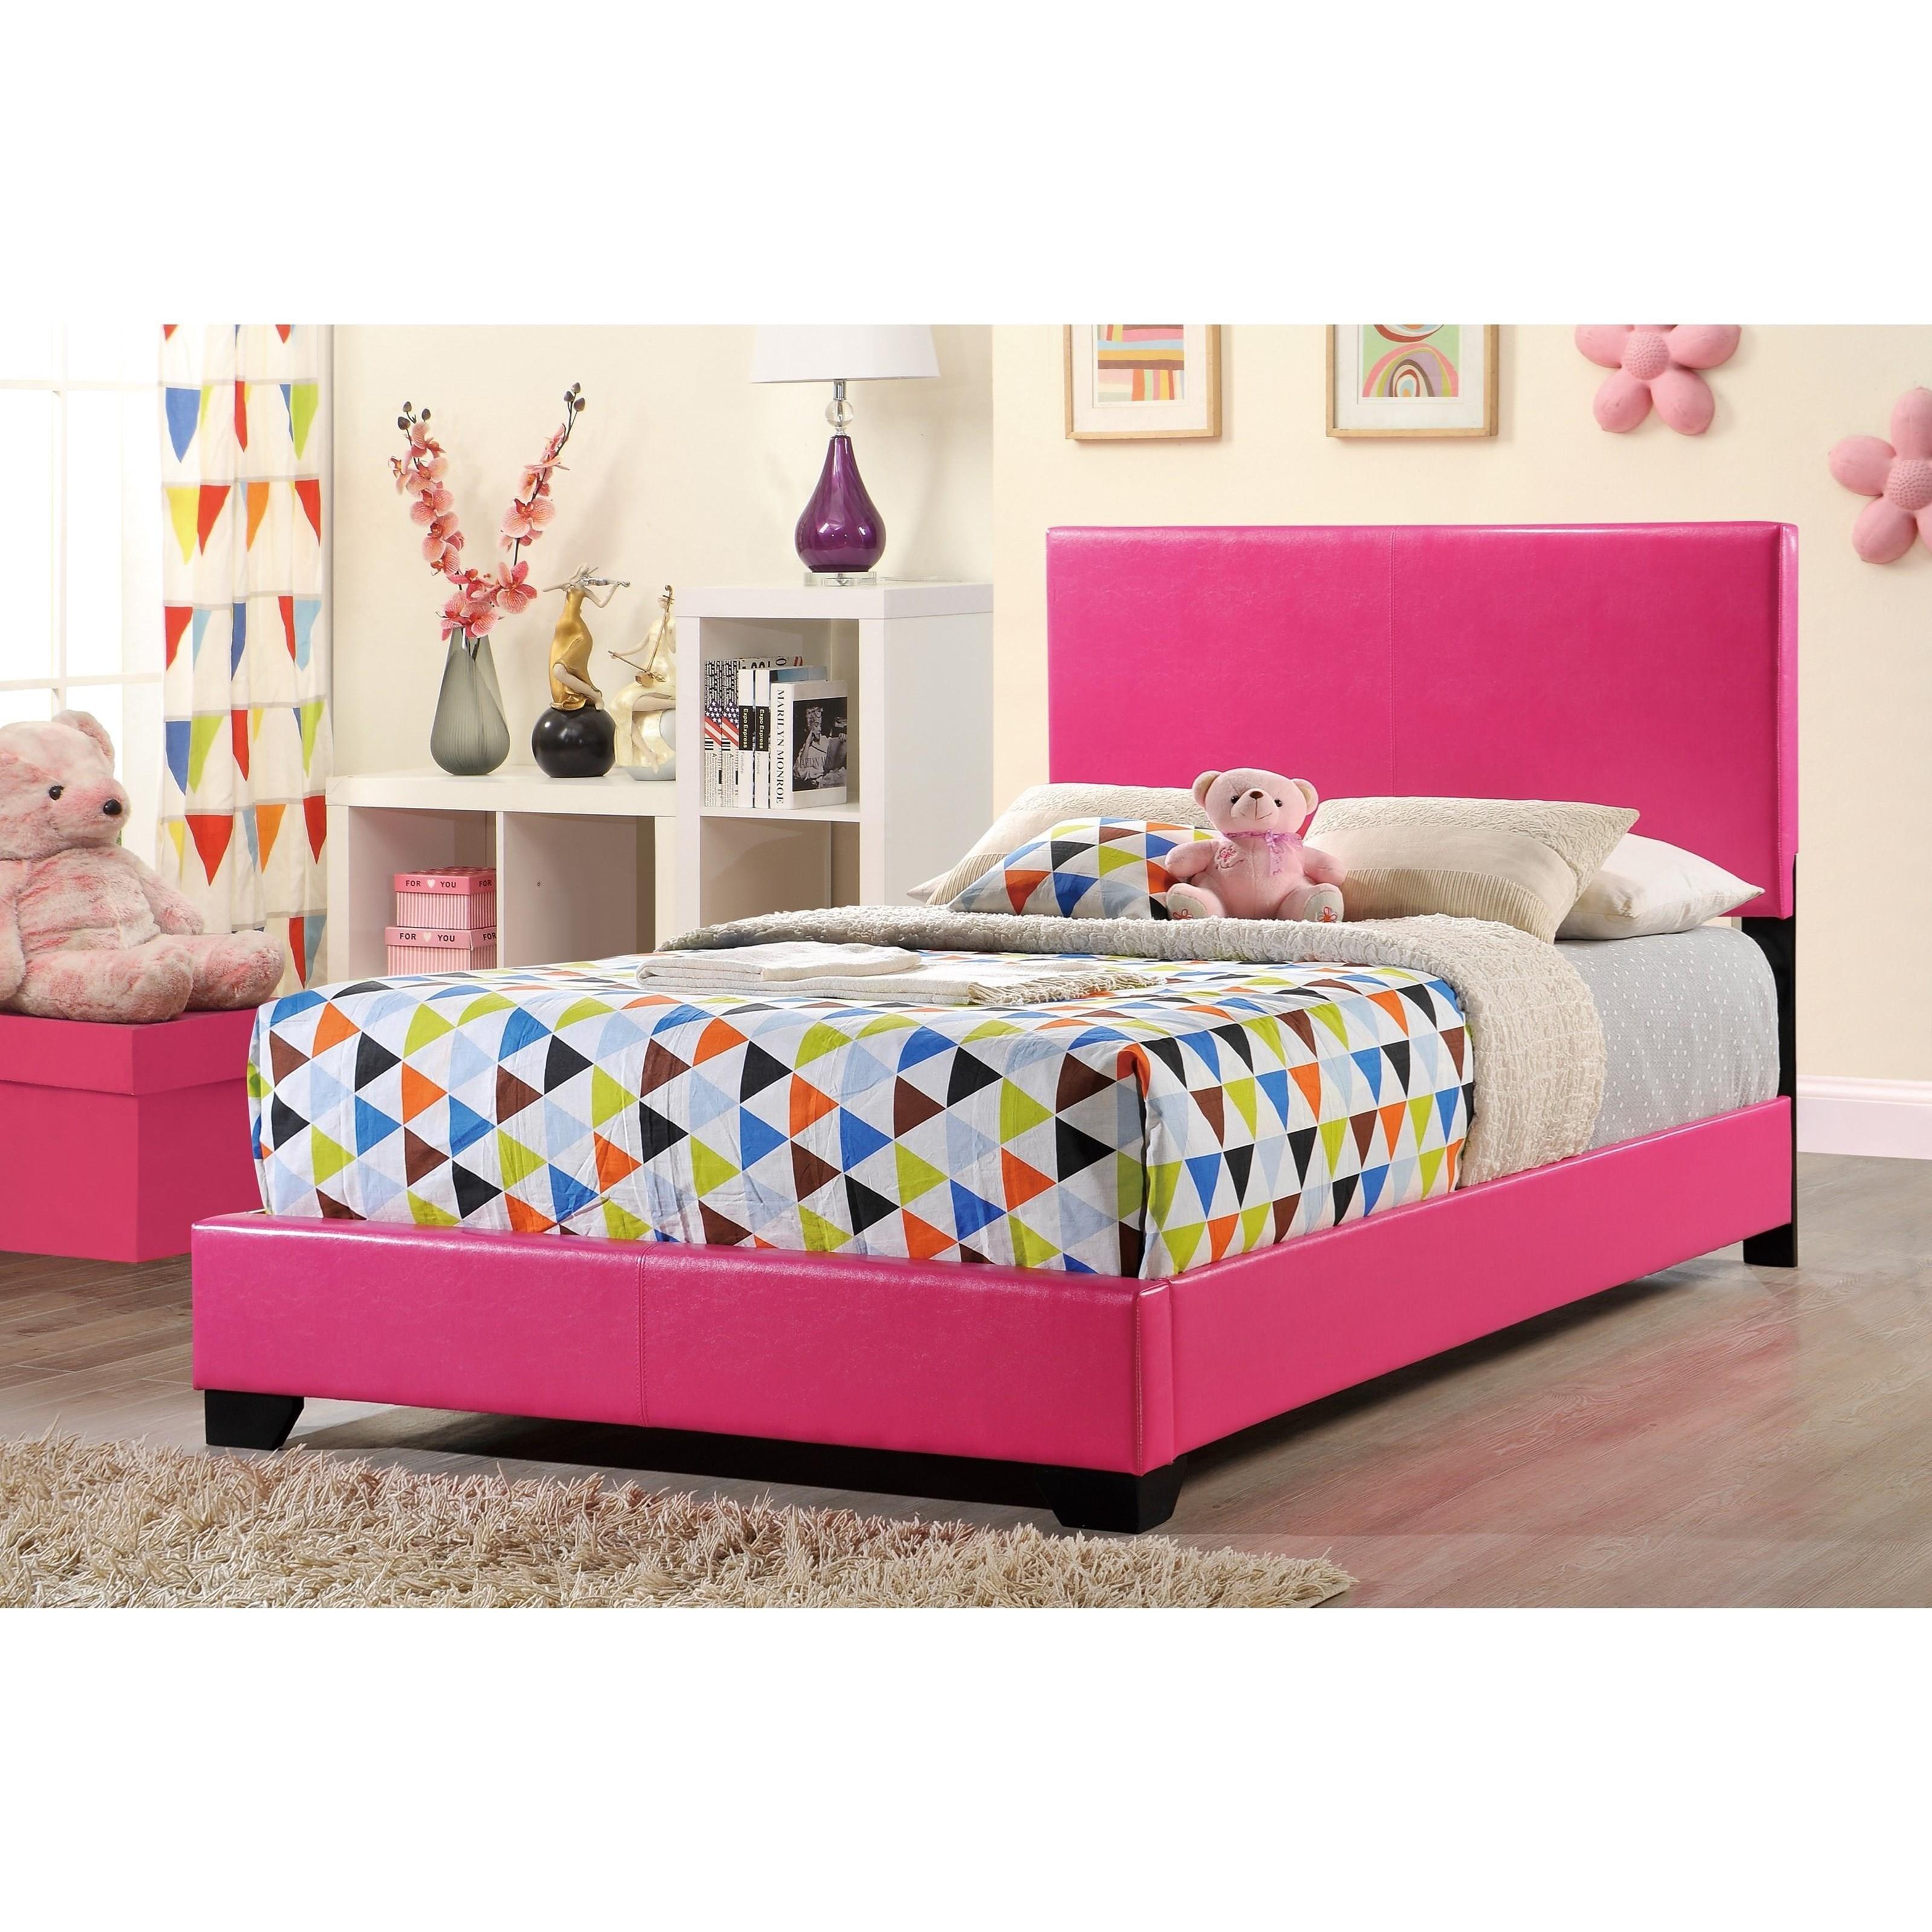 8103 Upholstered Full Bed by Global Furniture at Corner Furniture